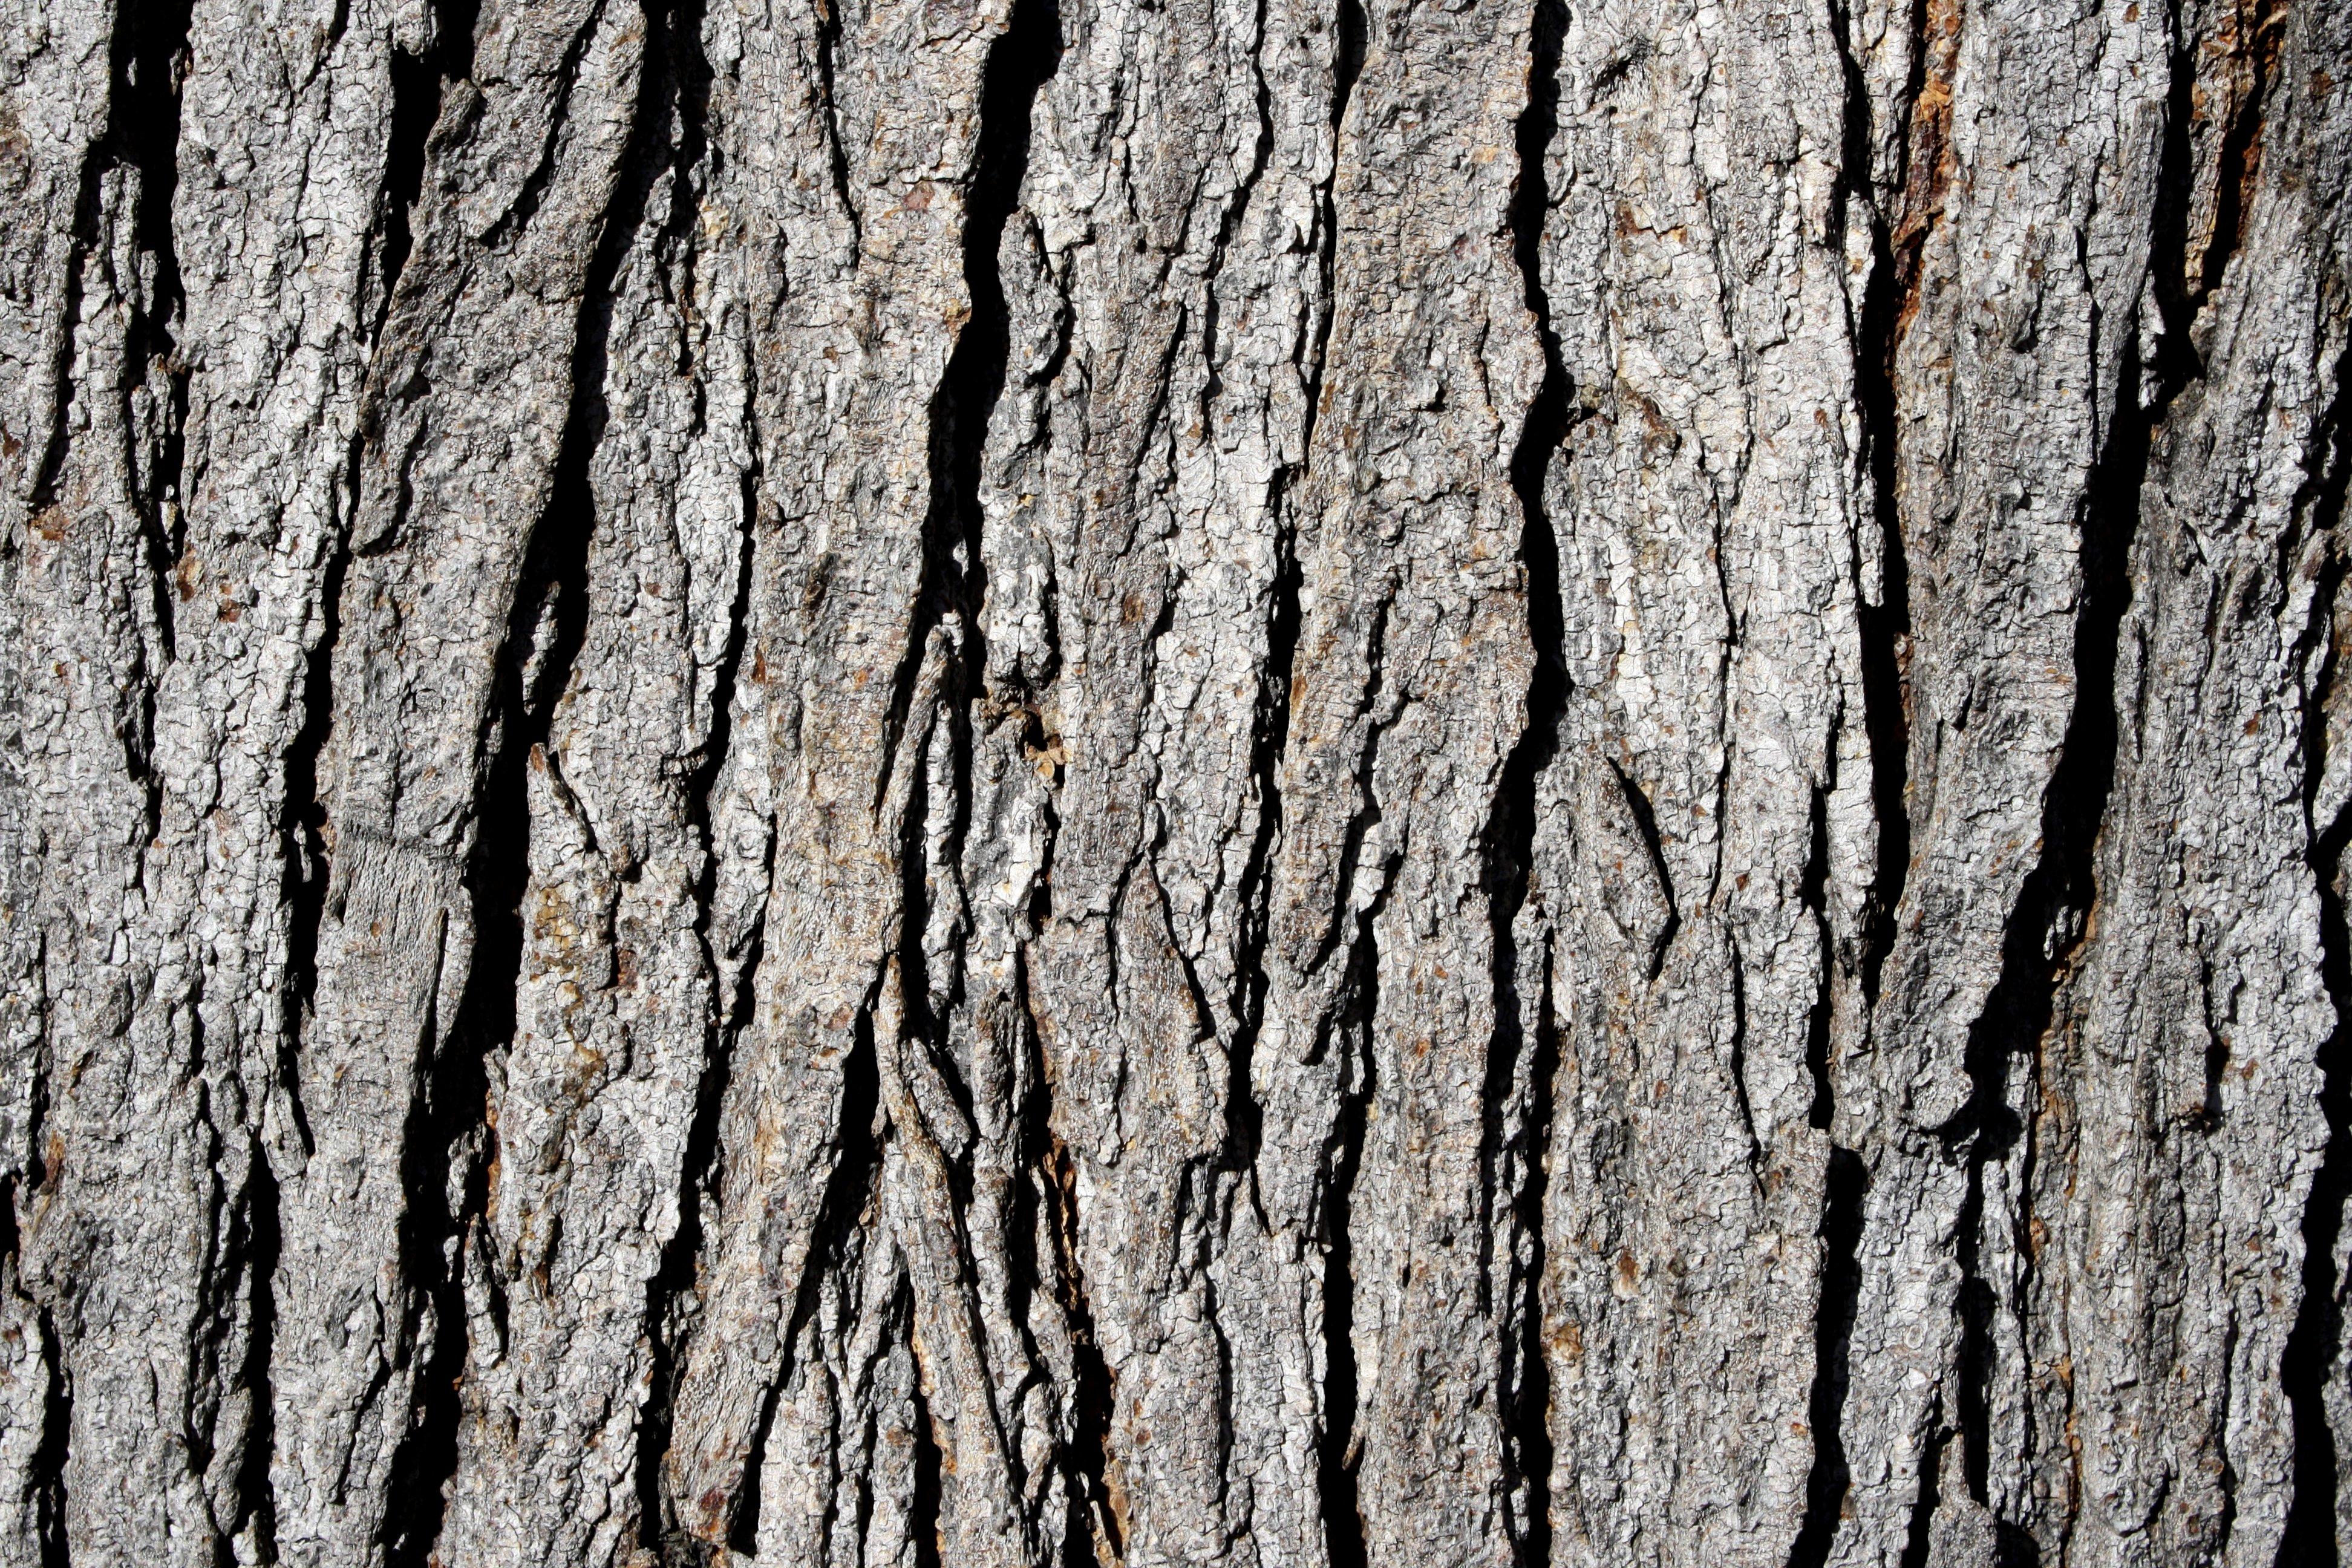 Tree Bark Texture Picture | Free Photograph | Photos Public Domain